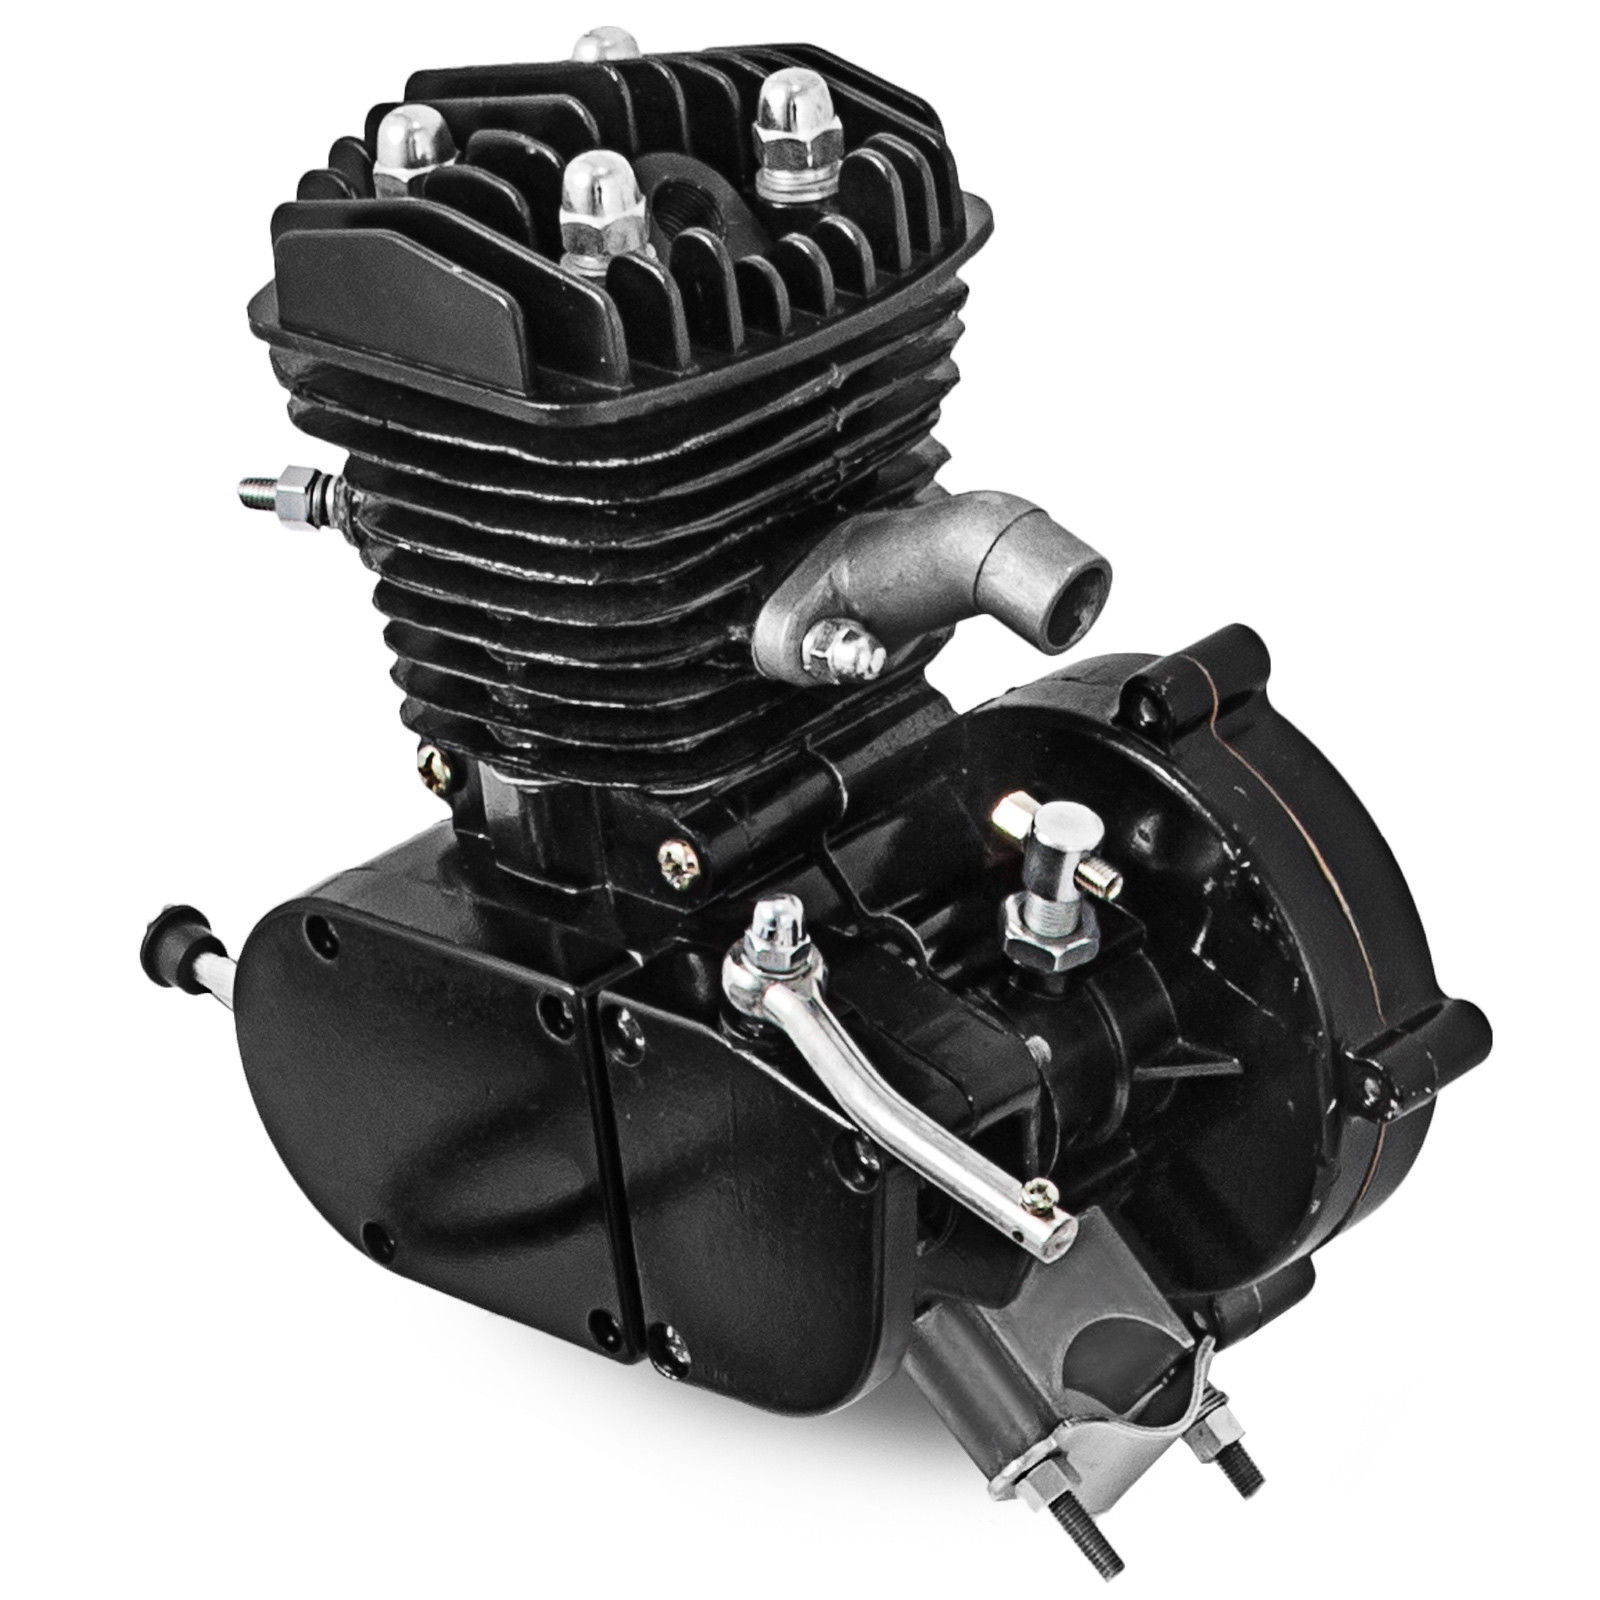 New Magneto Coil 80cc 66cc 2 Stroke Motor Engine Kit Motorised Bicycle Push Bike